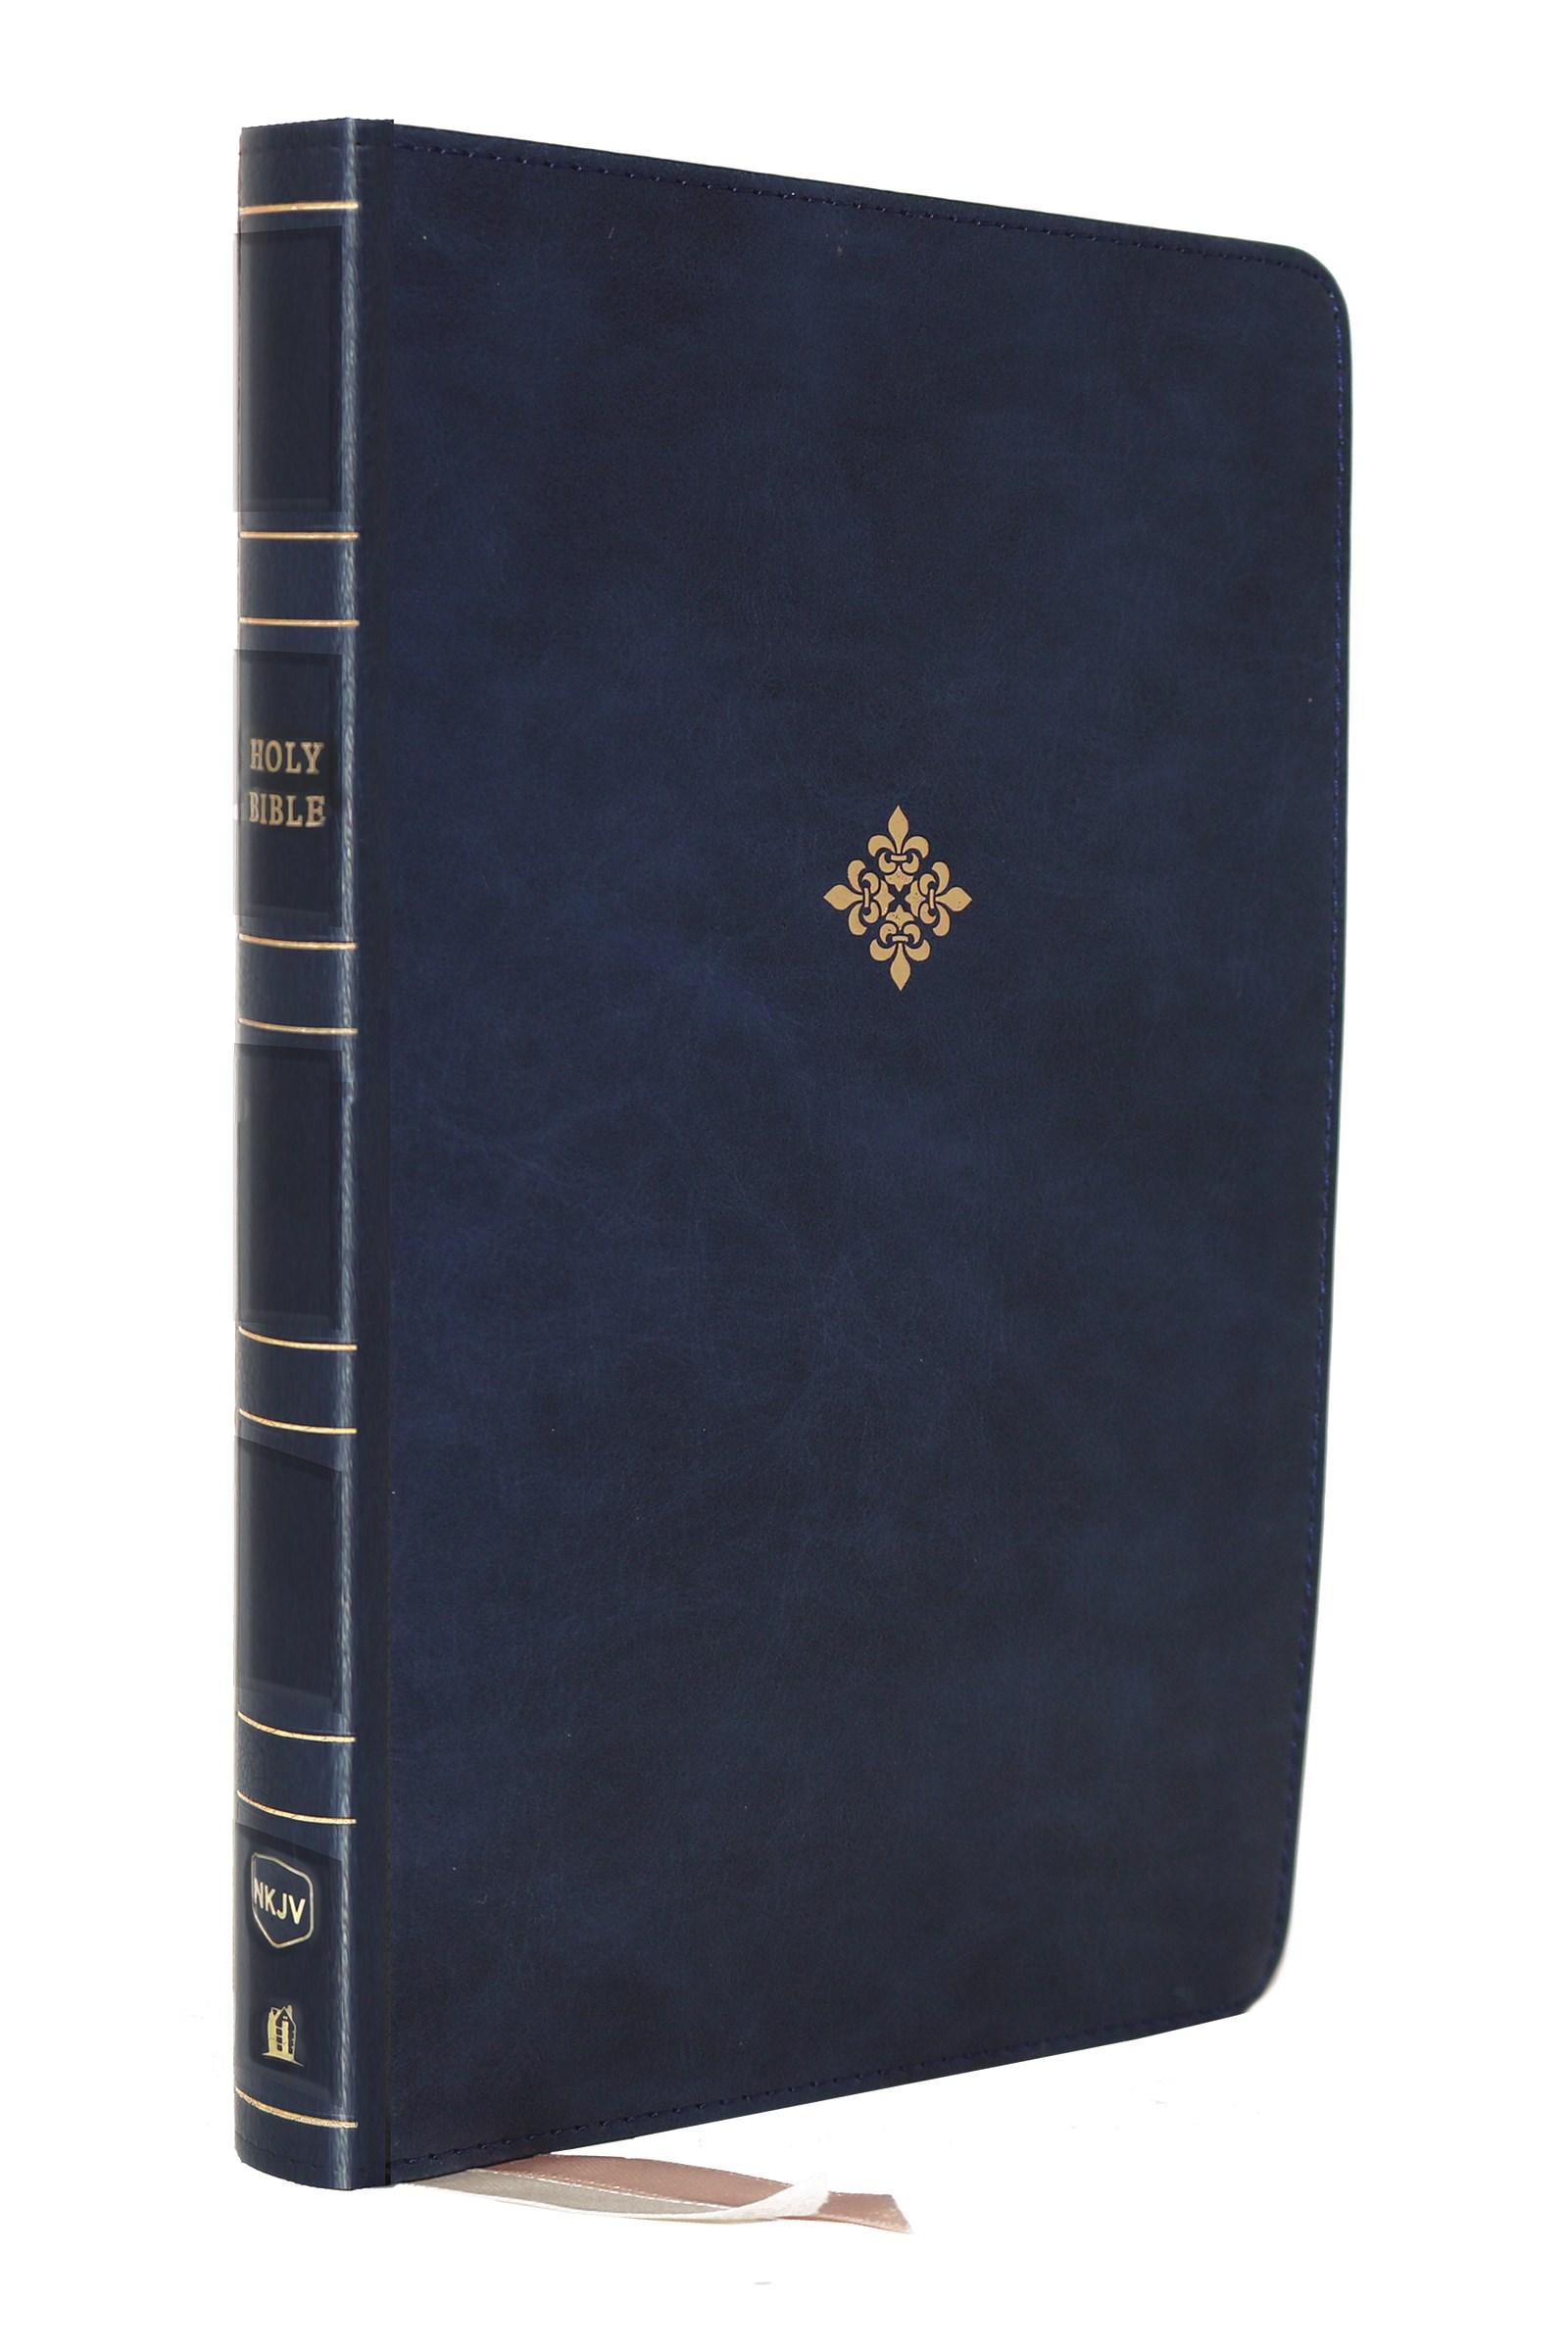 NKJV Large Print Thinline Reference Bible (Comfort Print)-Blue Leathersoft